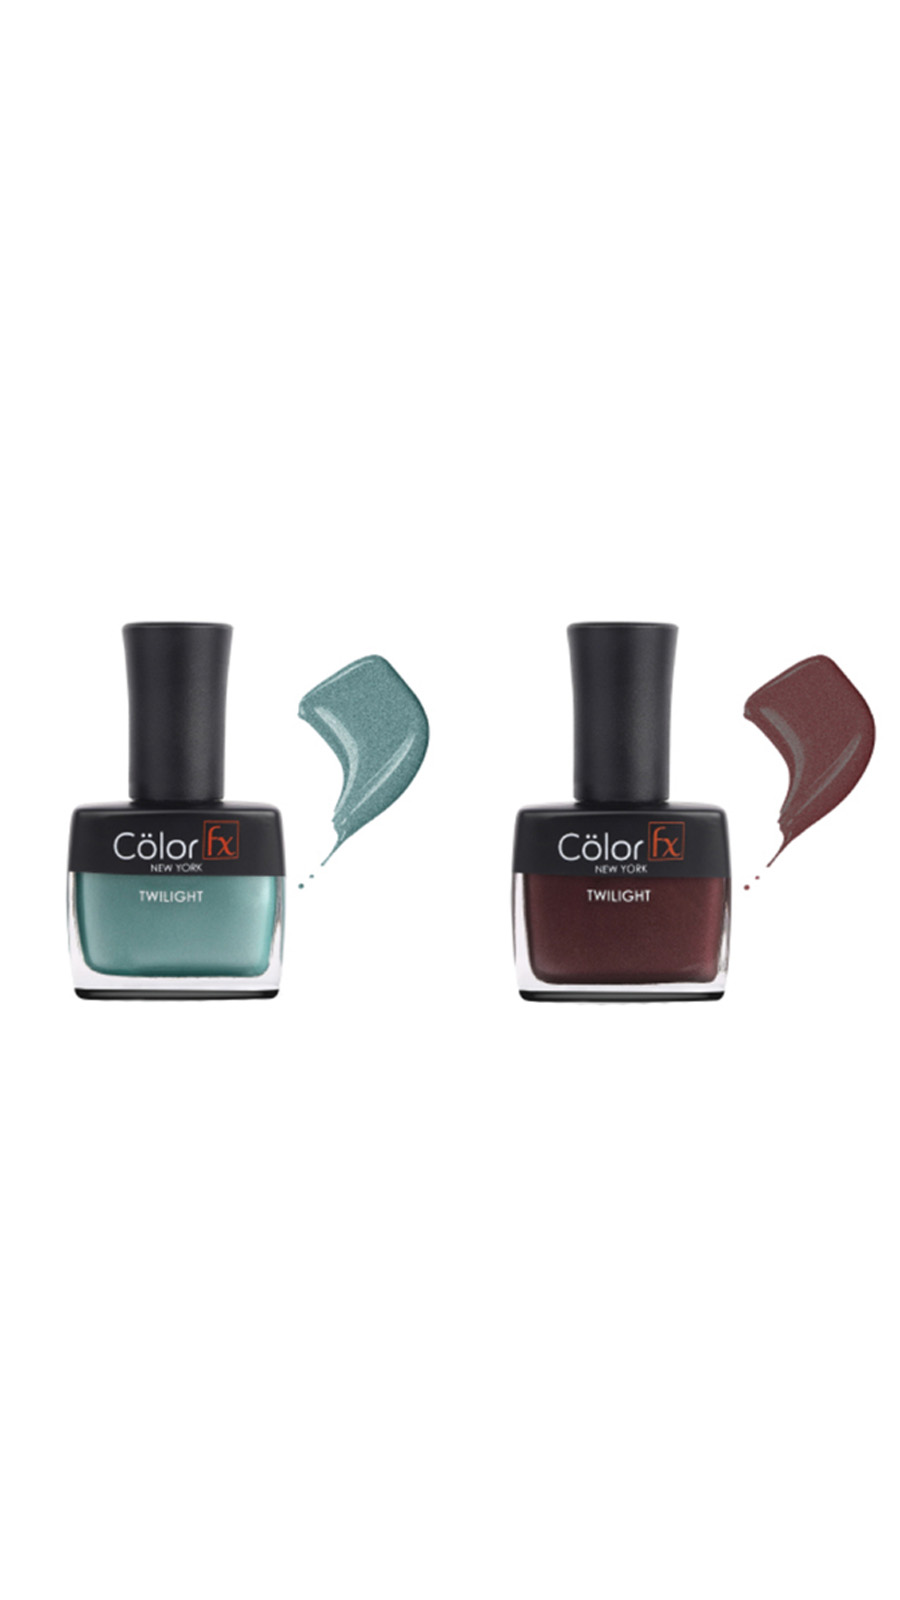 Color Fx | Color Fx Nail Enamel Twilight - Festive Collection Pack of 2